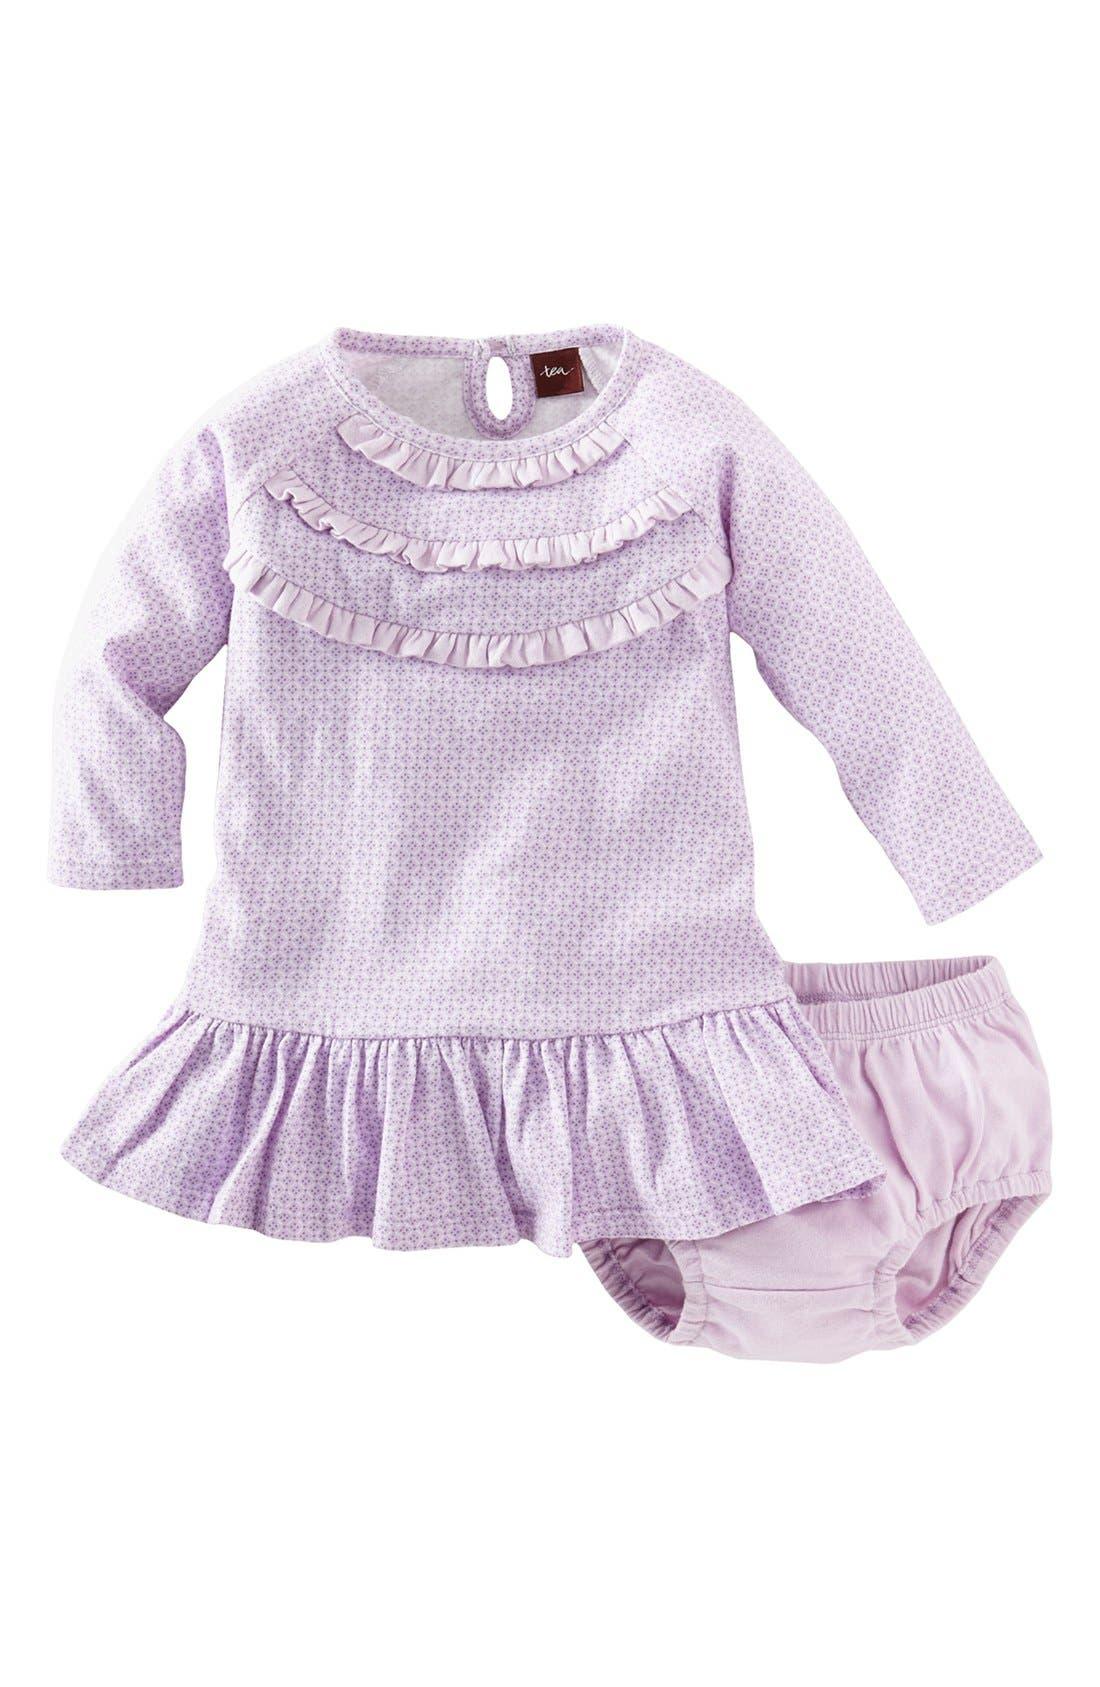 Main Image - Tea Collection 'Diamond' Dress & Bloomers (Baby Girls)